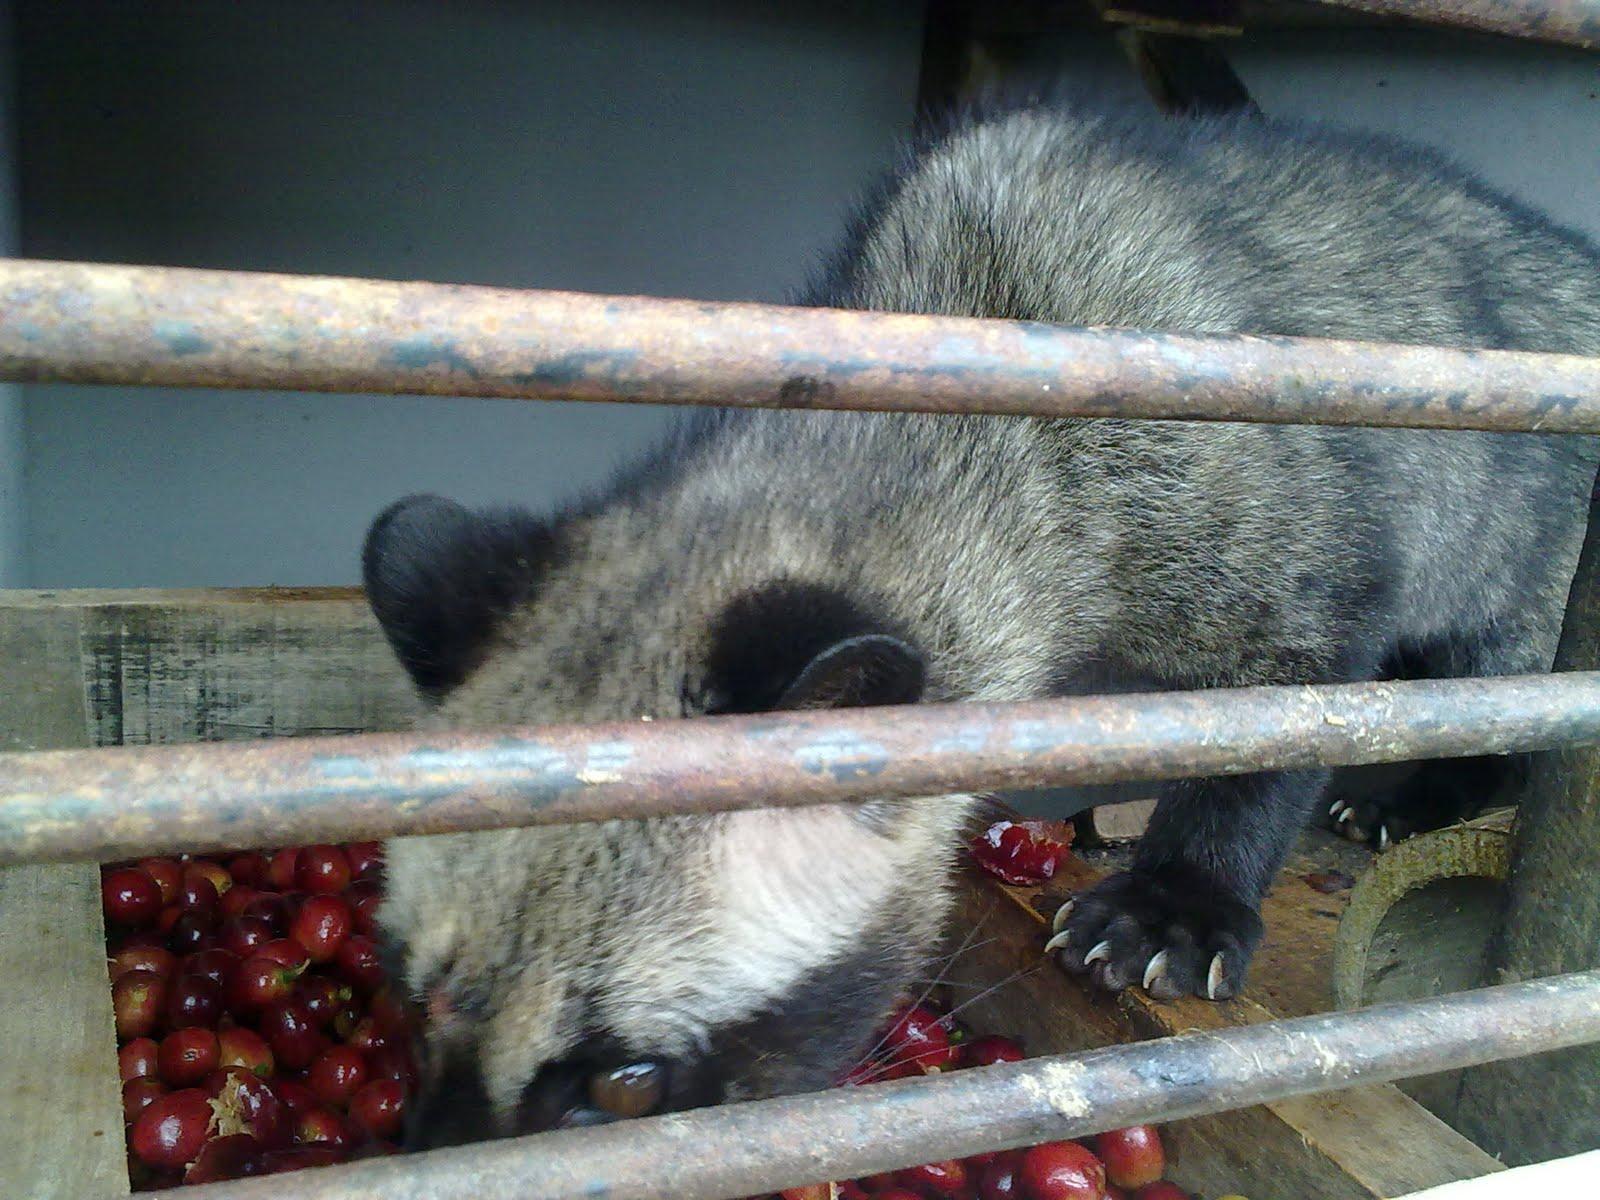 gambar binatang luwak di kandang ketika memakan biji kopi ceri